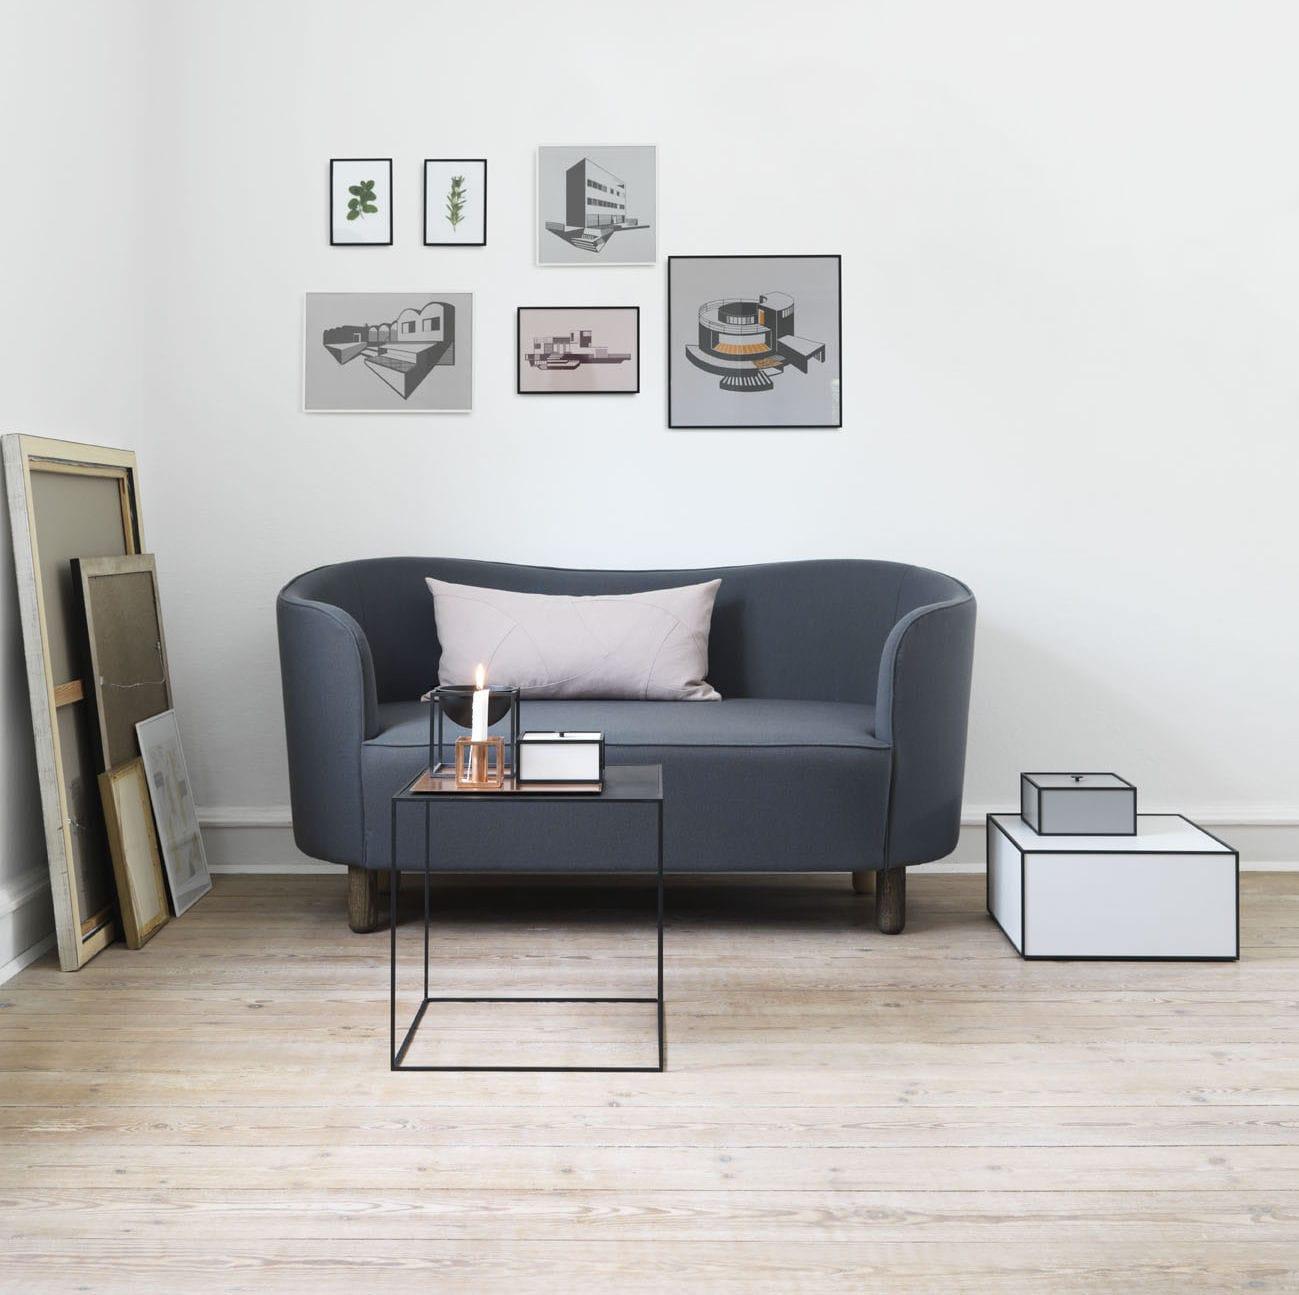 Scandinavian Design Sofa Fabric 3 Seater Gray Mingle